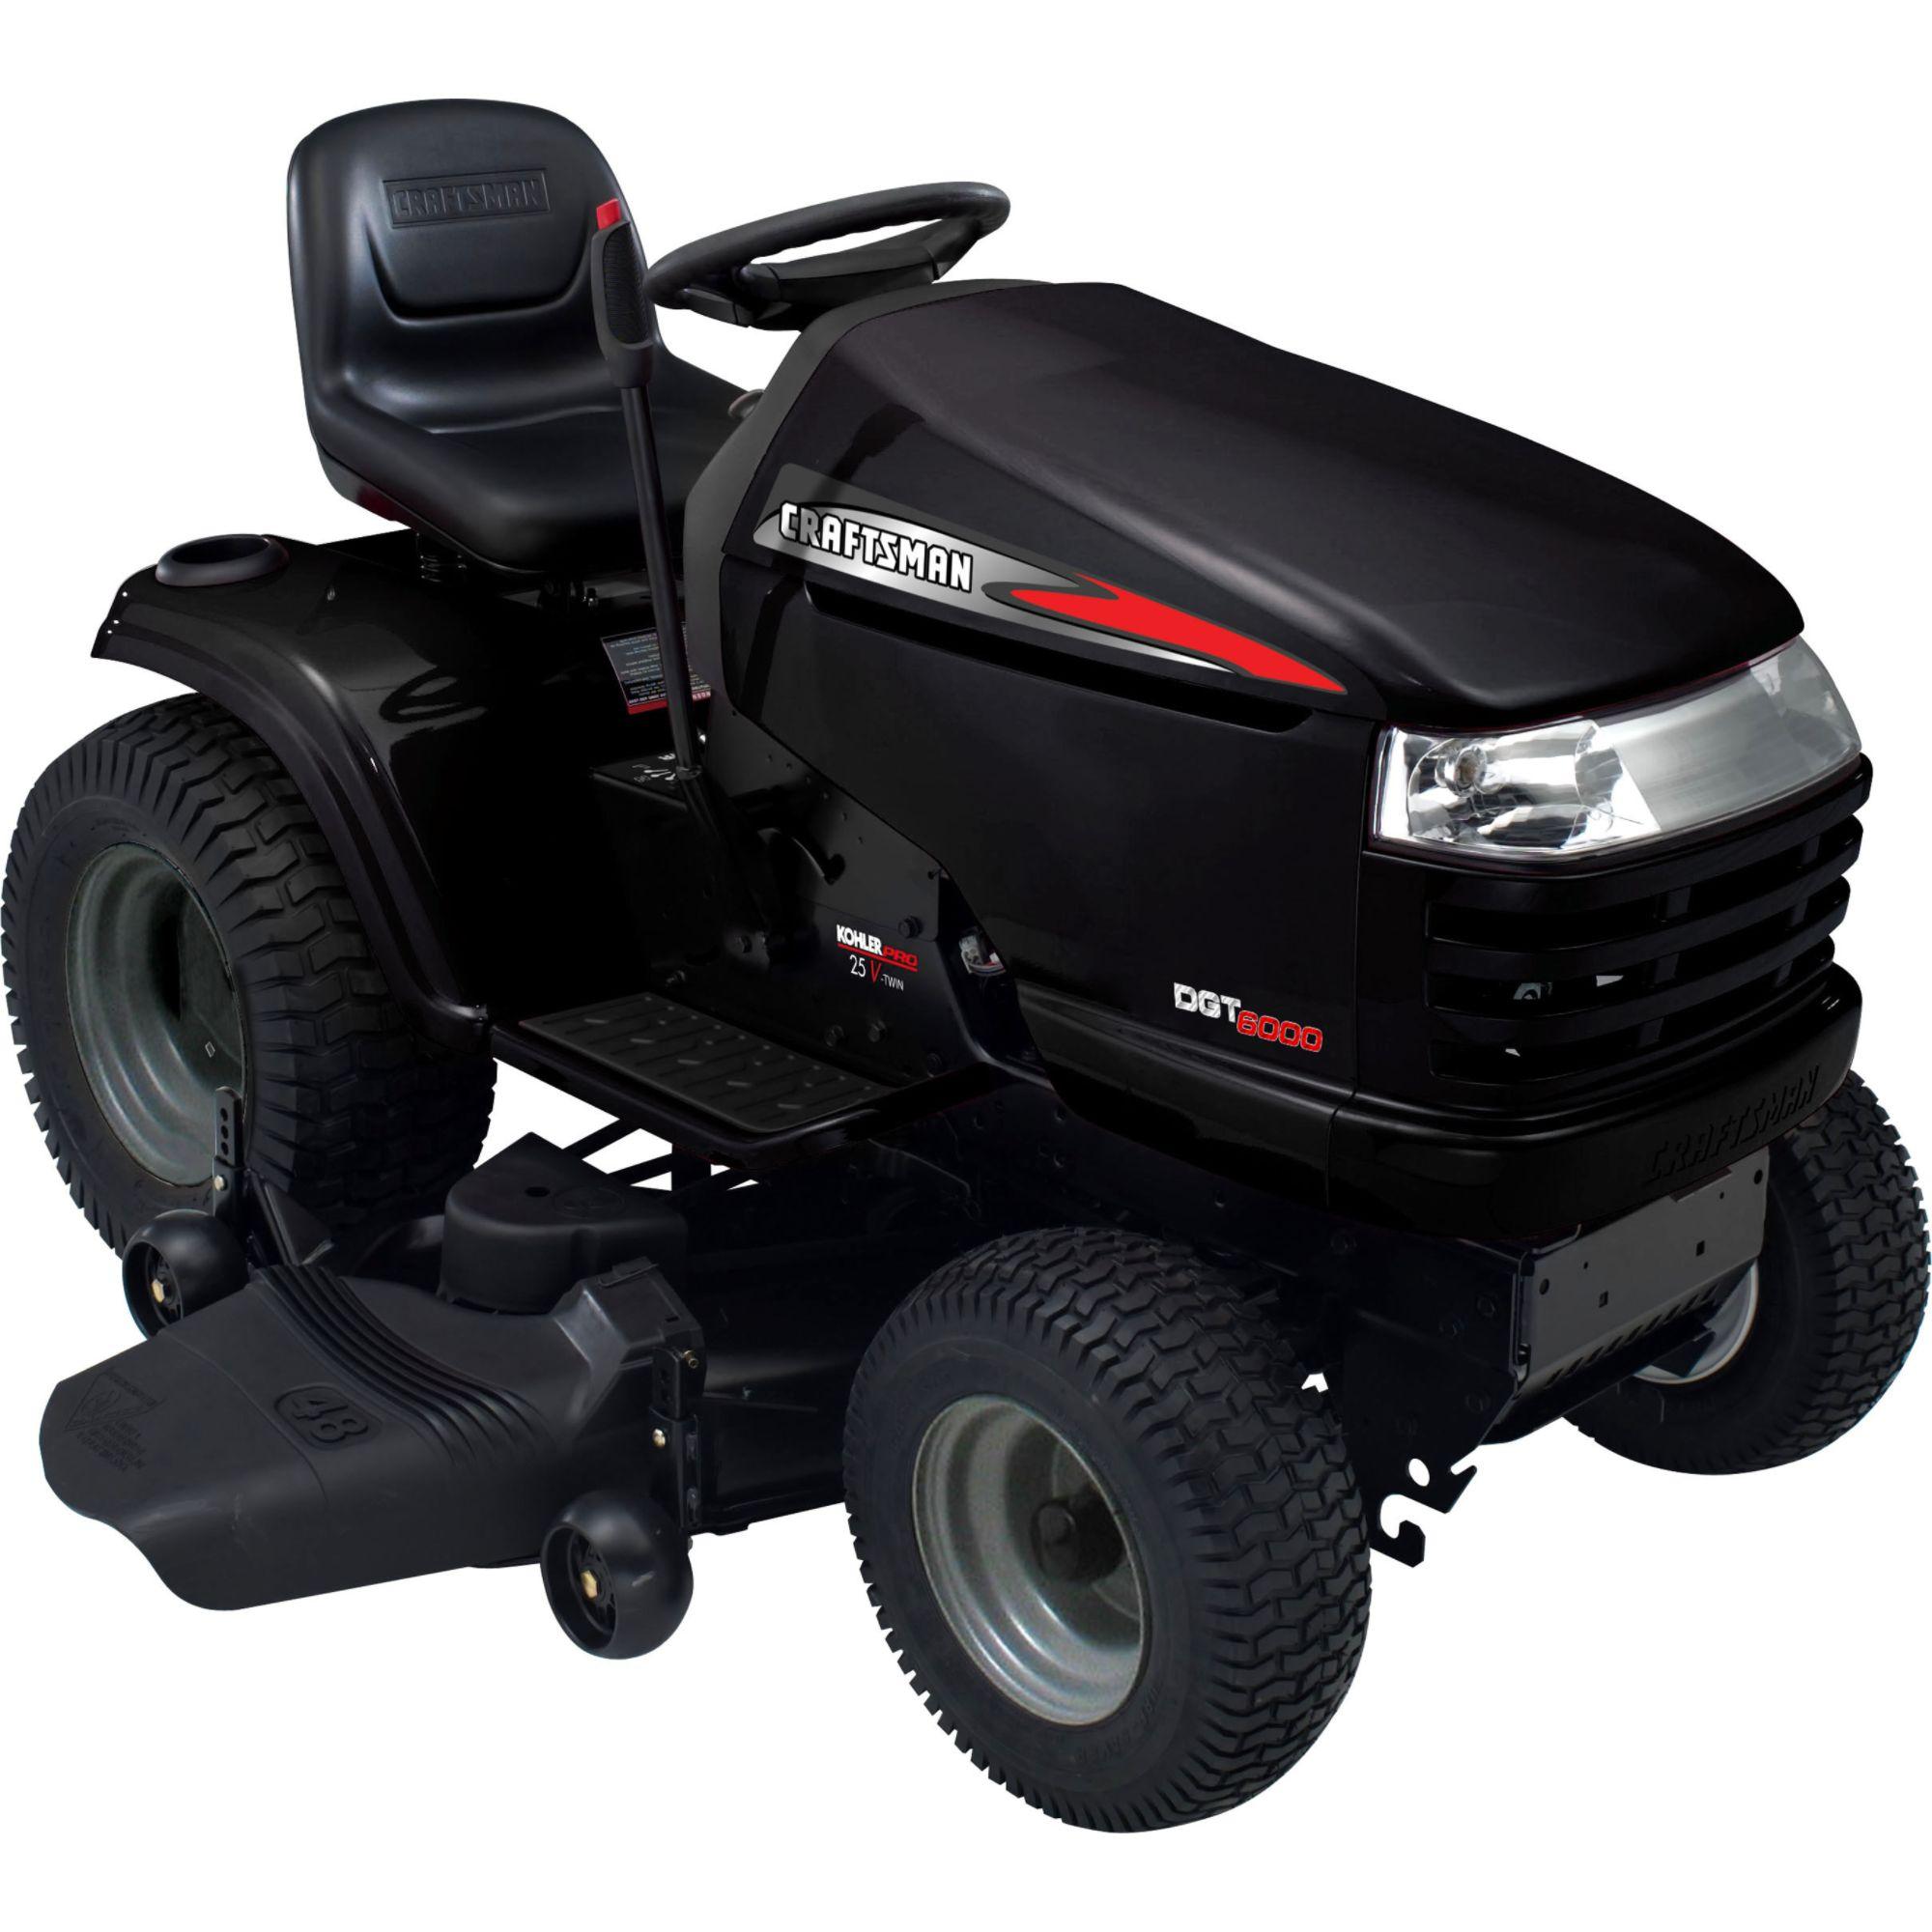 hight resolution of craftsman gt5000 garden tractor parts designs